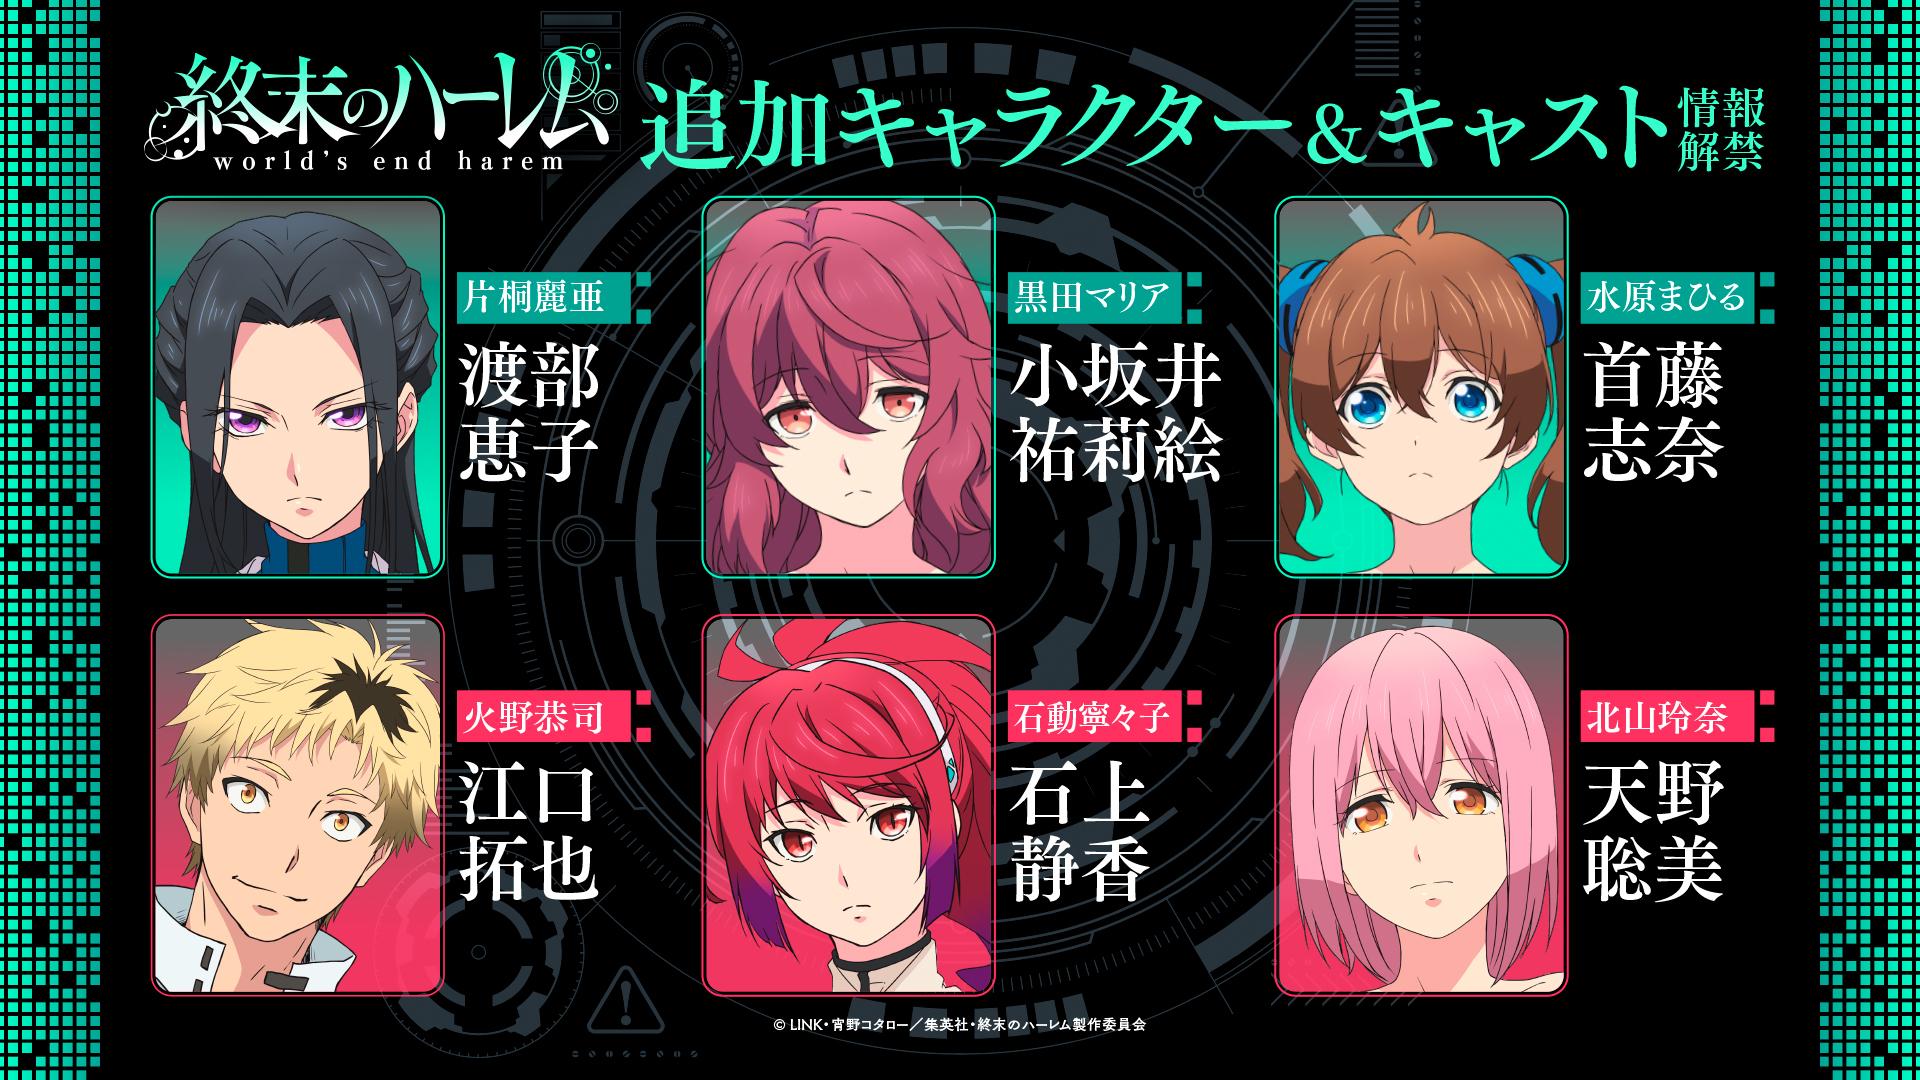 (C)LINK・宵野コタロー/集英社・終末のハーレム製作委員会